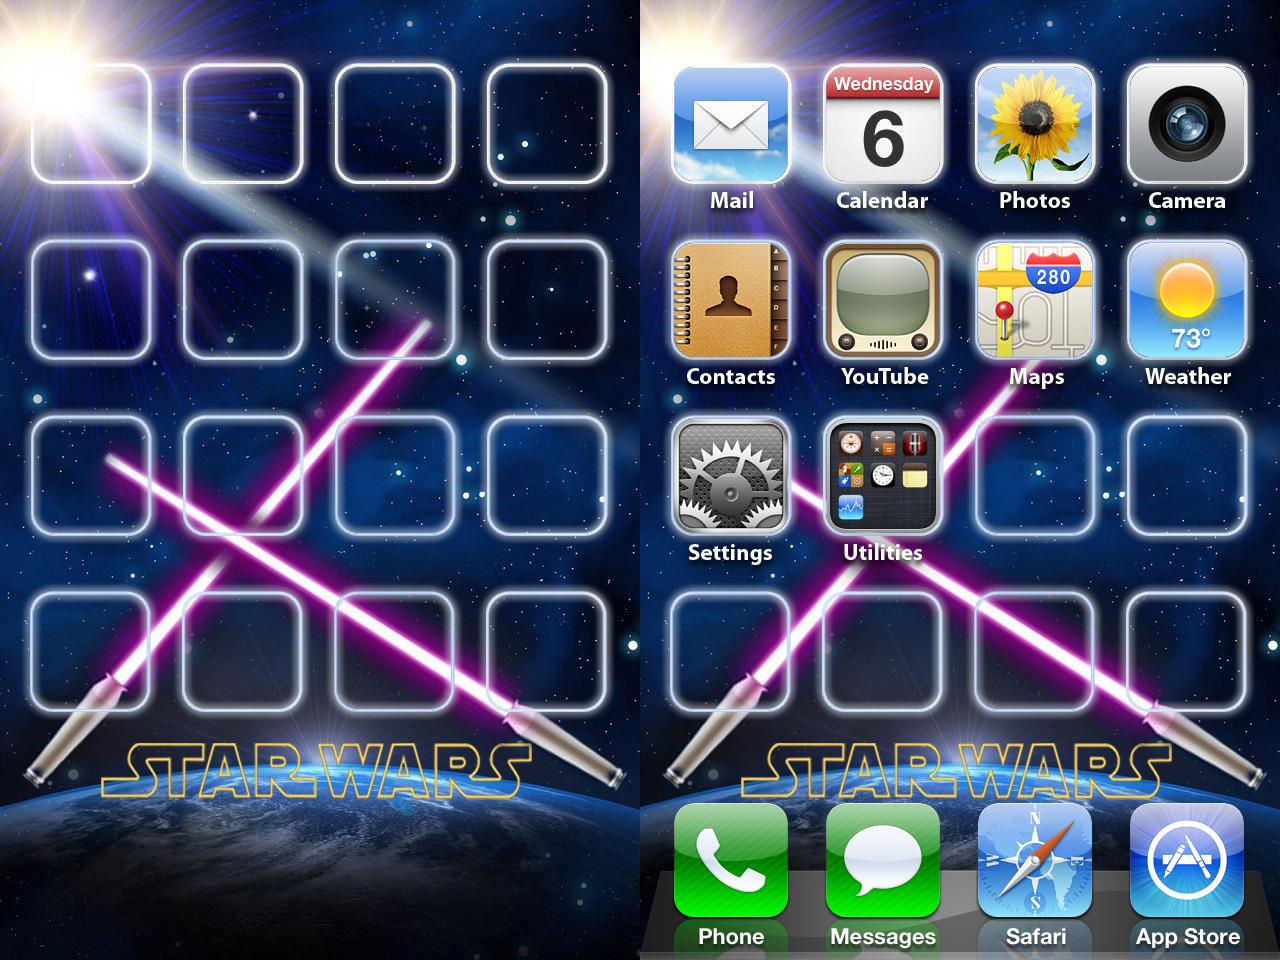 IPhone Star Wars Wallpaper By ChrisssG On DeviantArt